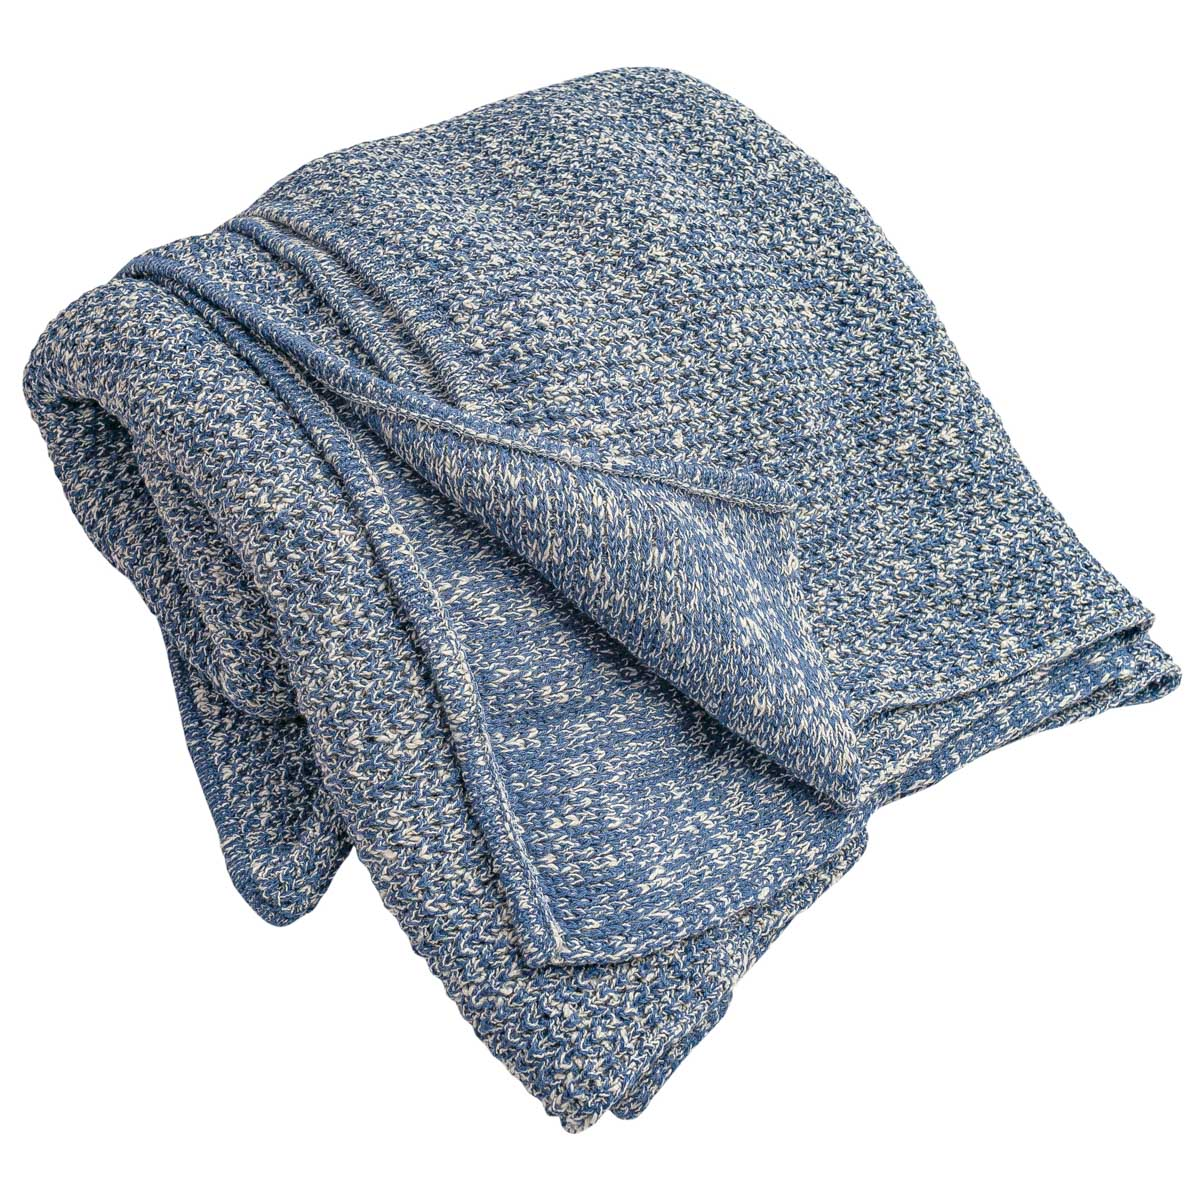 Tricot Mescla Azul Jeans